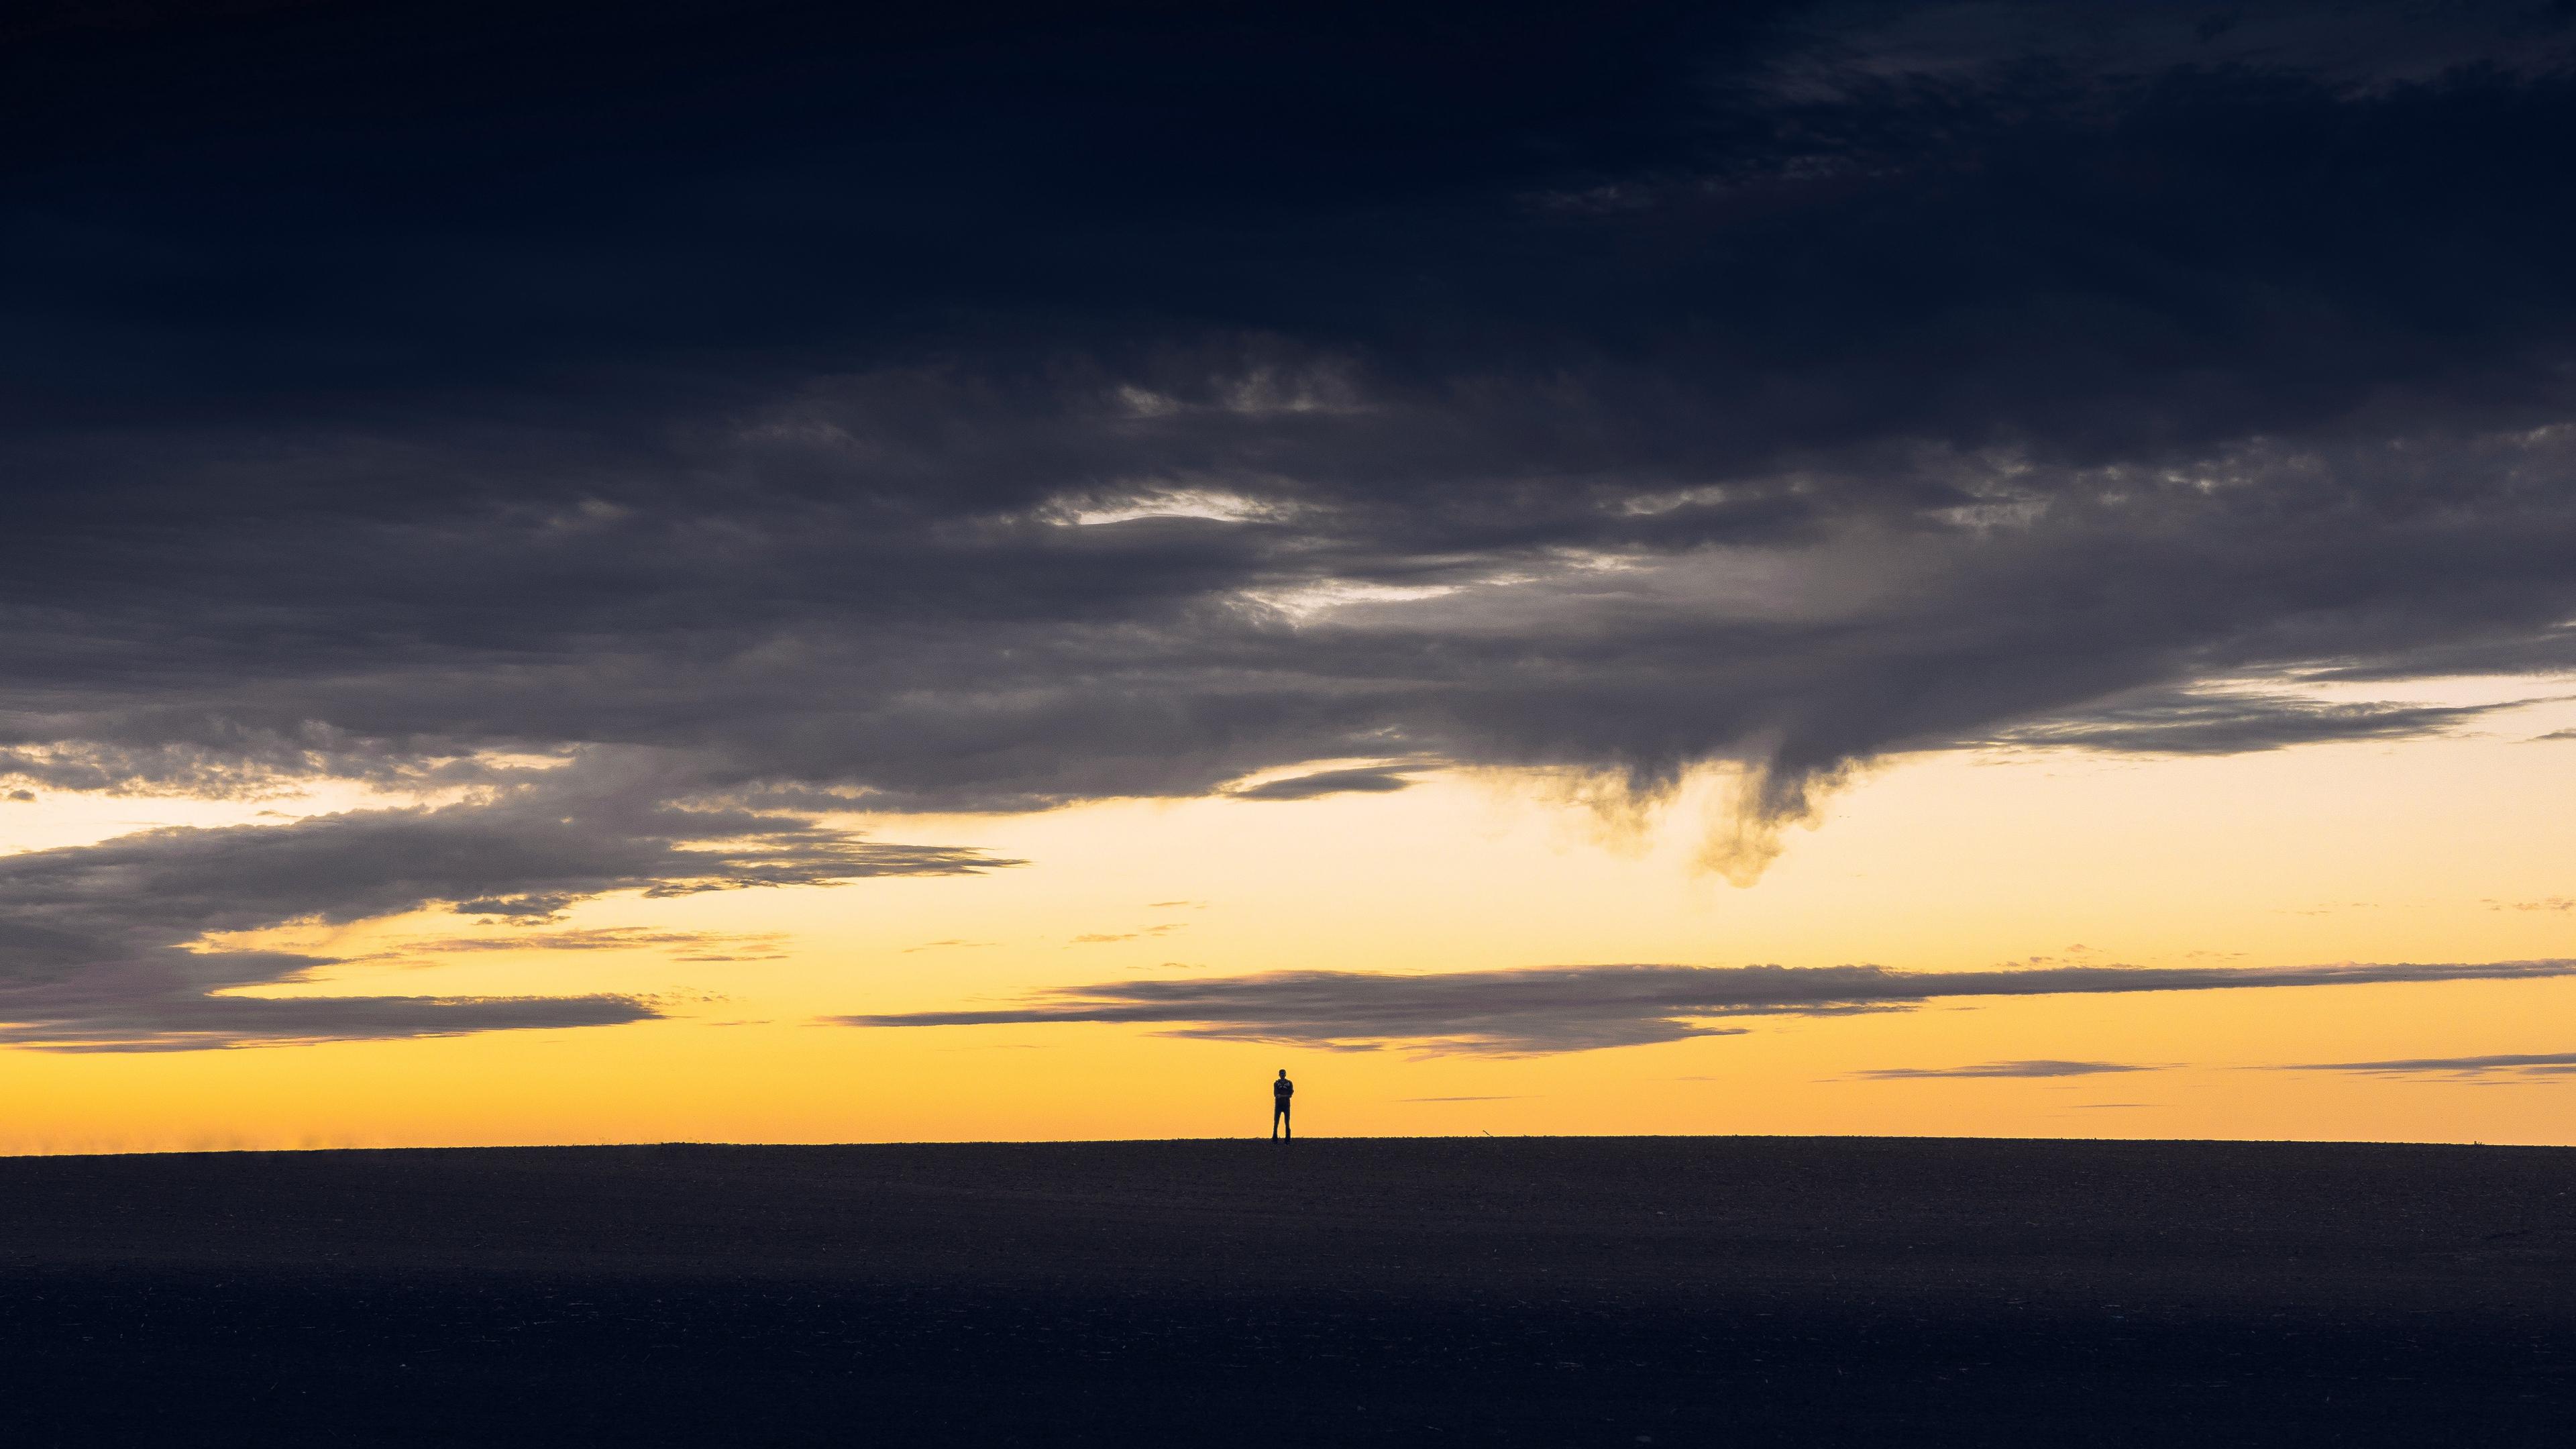 sunset silhouette sky man 4k 1541116453 - sunset, silhouette, sky, man 4k - sunset, Sky, Silhouette